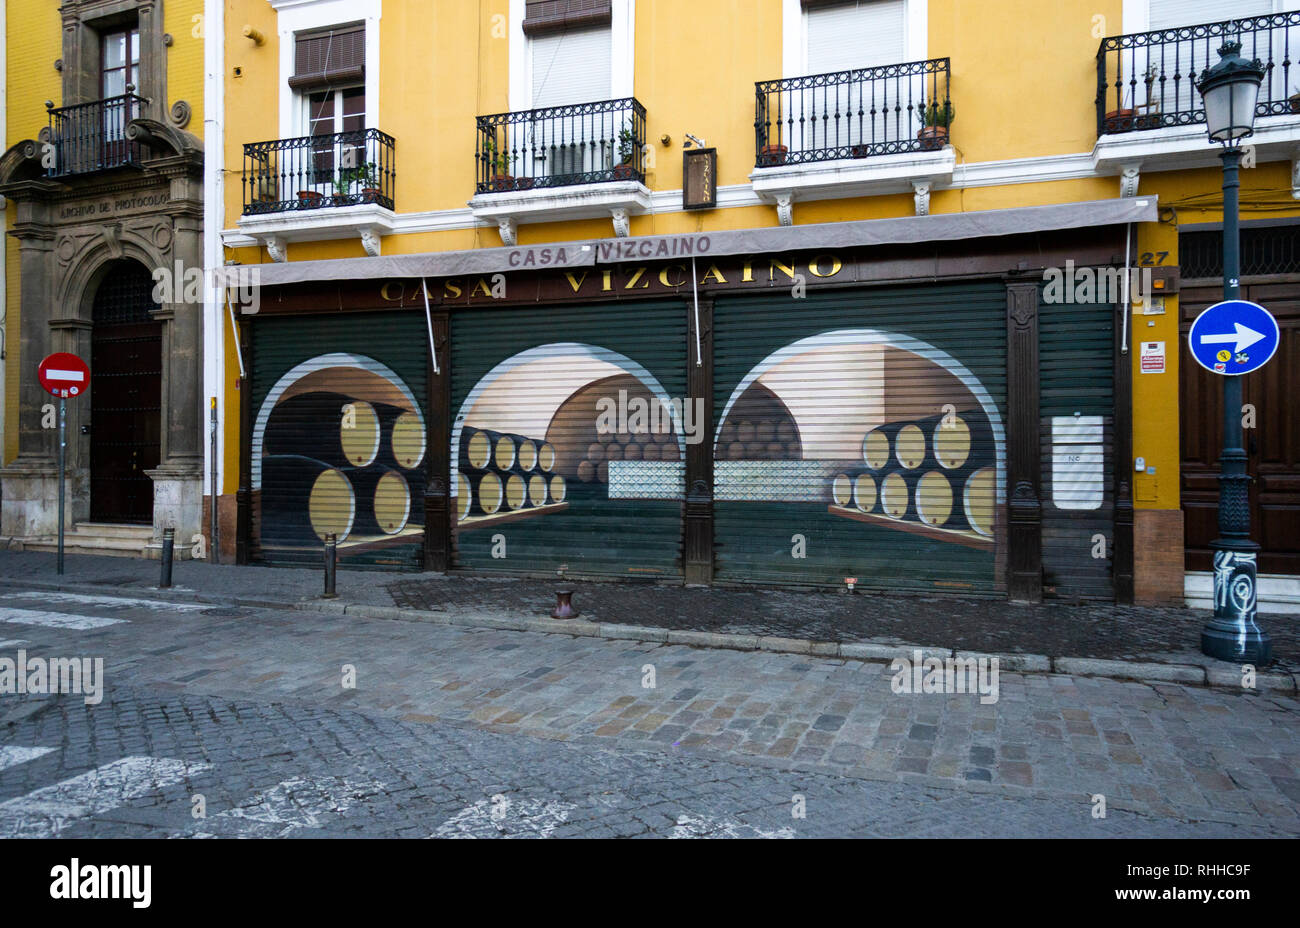 Casa Vizcaino, a popular bar on Calle Feria in Seville, Spain, closed for siesta - Stock Image